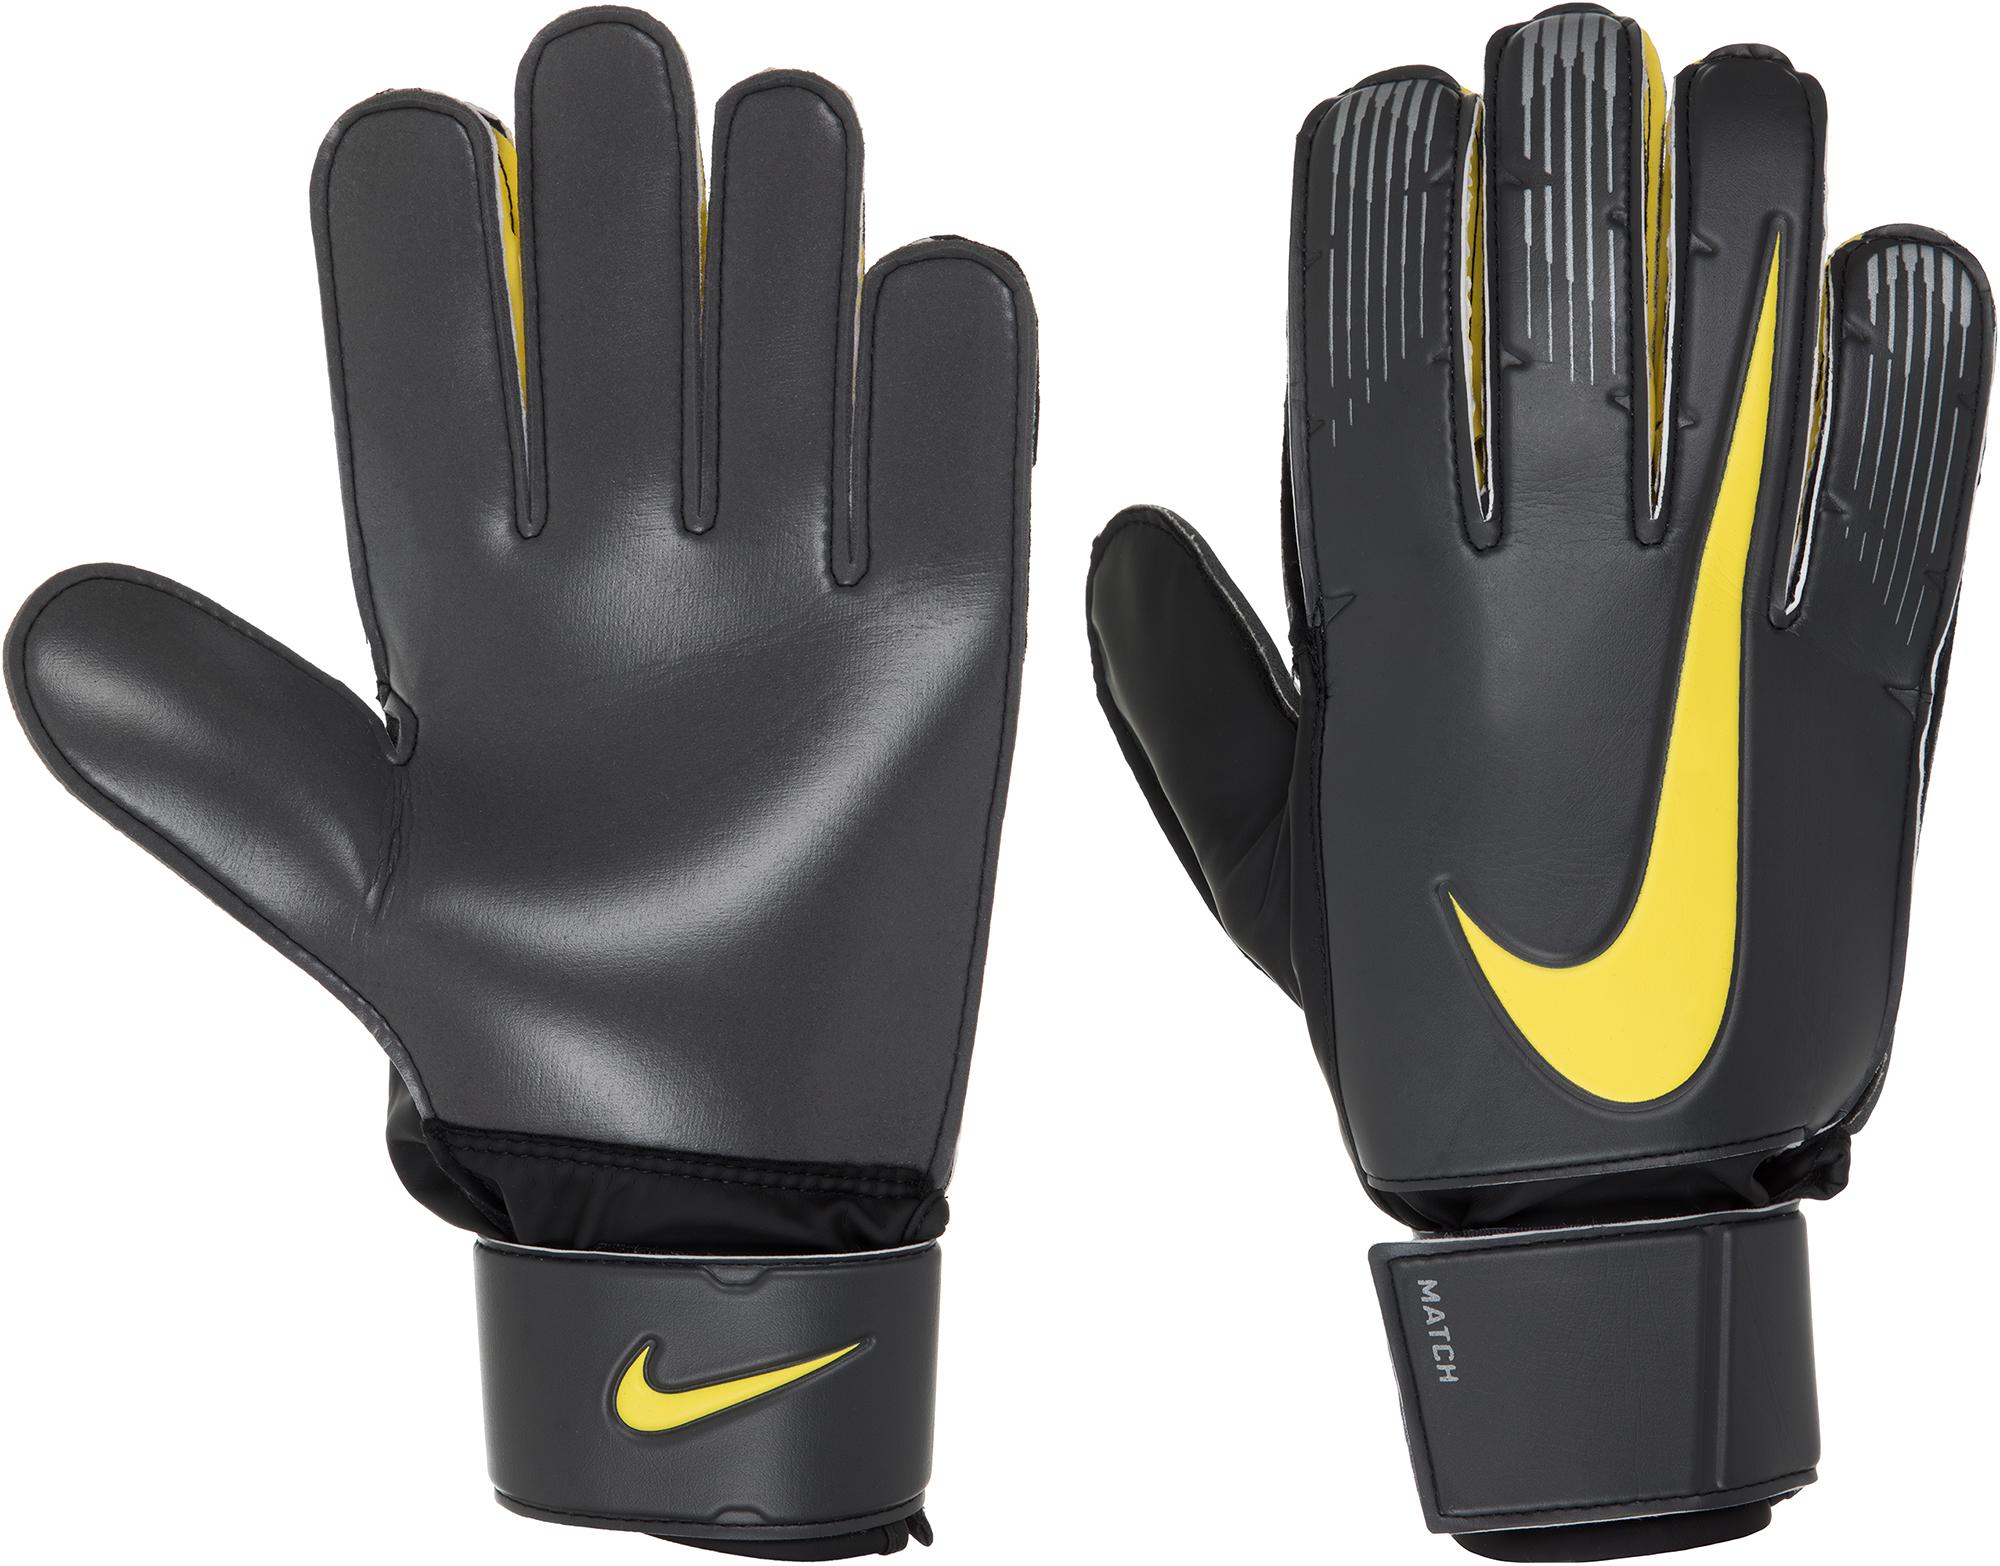 Nike Перчатки вратарские Nike Match Goalkeeper, размер 10 nike перчатки женские nike размер s